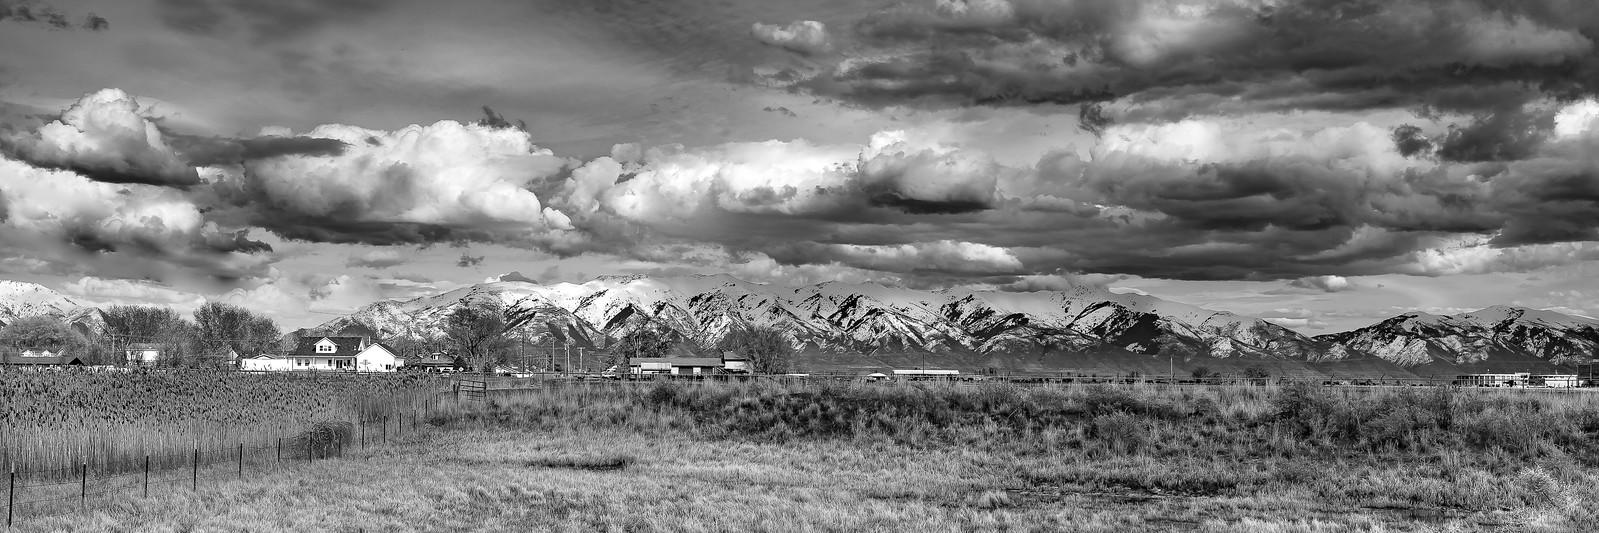 Région du Grand Lac Salé, Utah 33913747538_ab7f7aa647_h